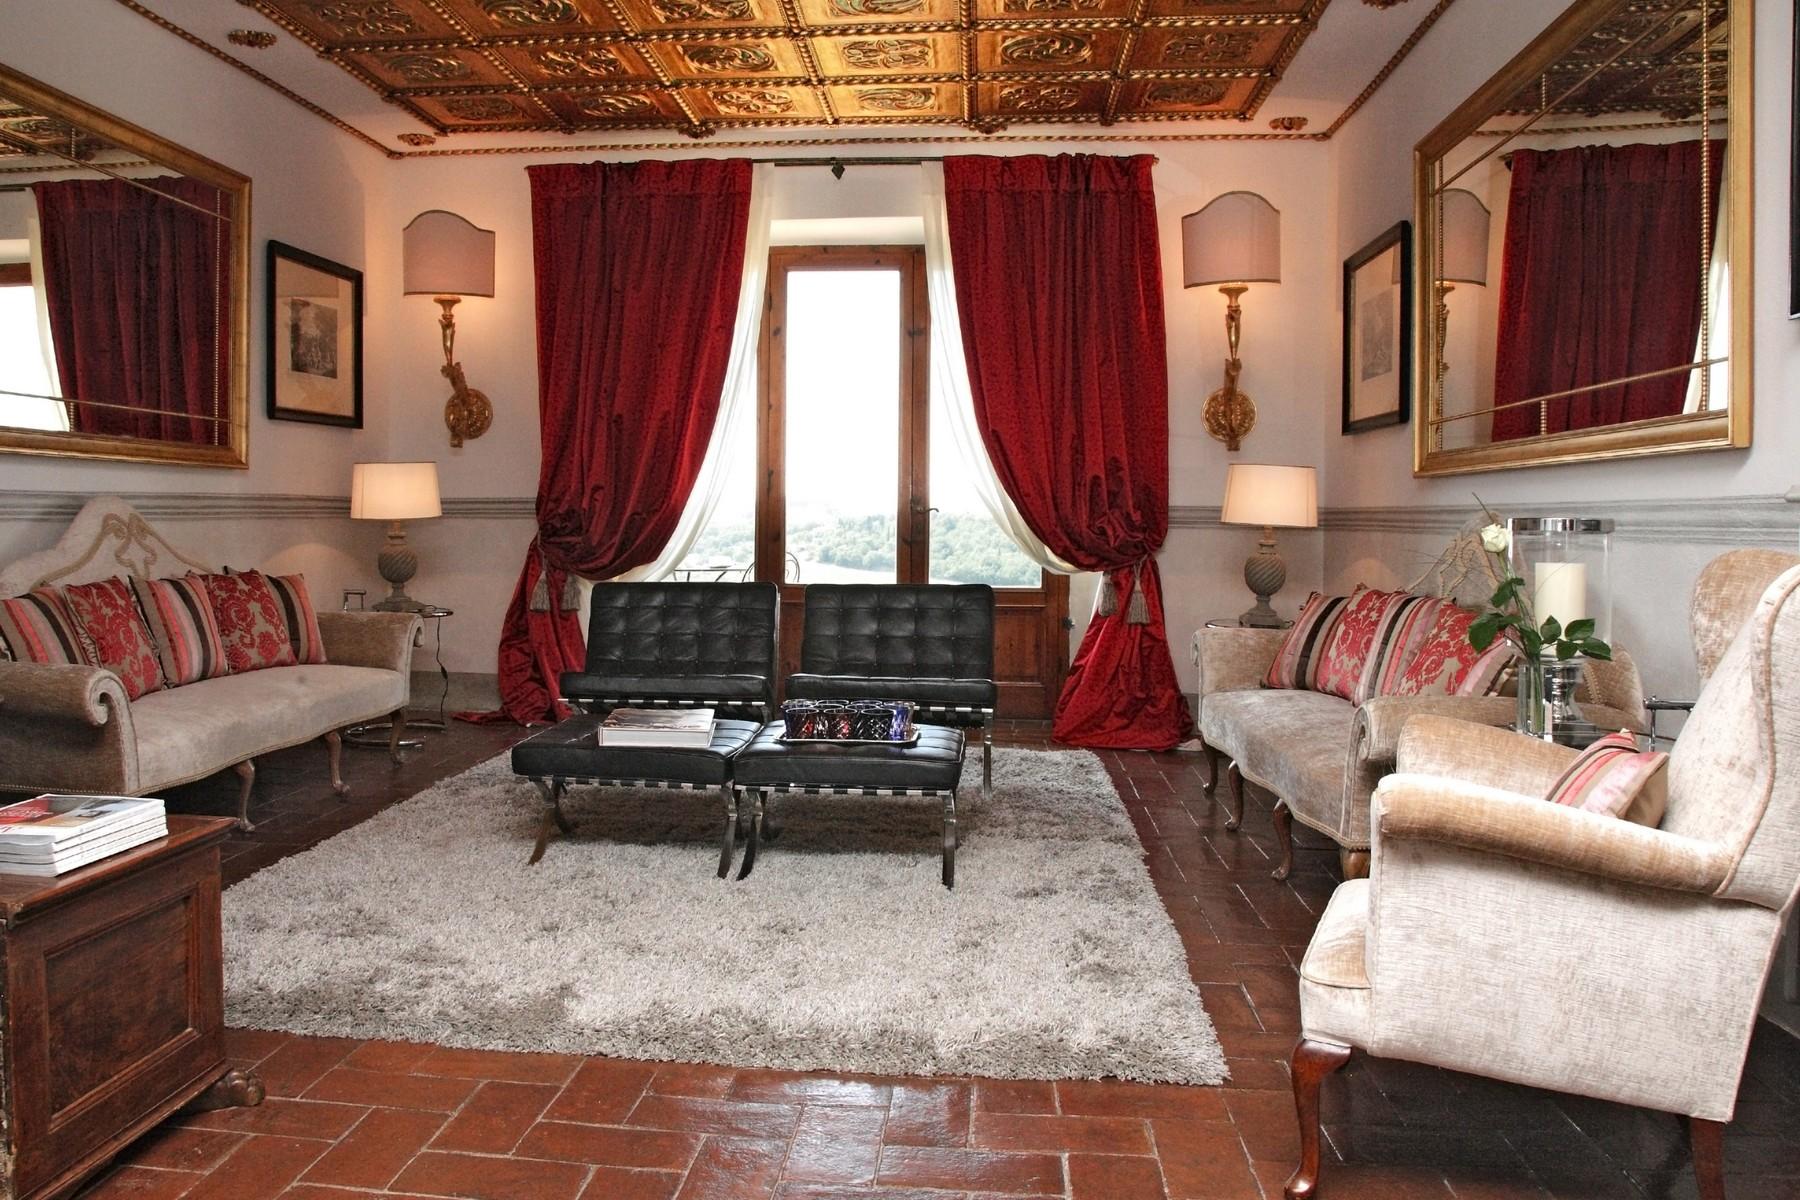 Villa in Vendita a Gaiole In Chianti: 5 locali, 4285 mq - Foto 5